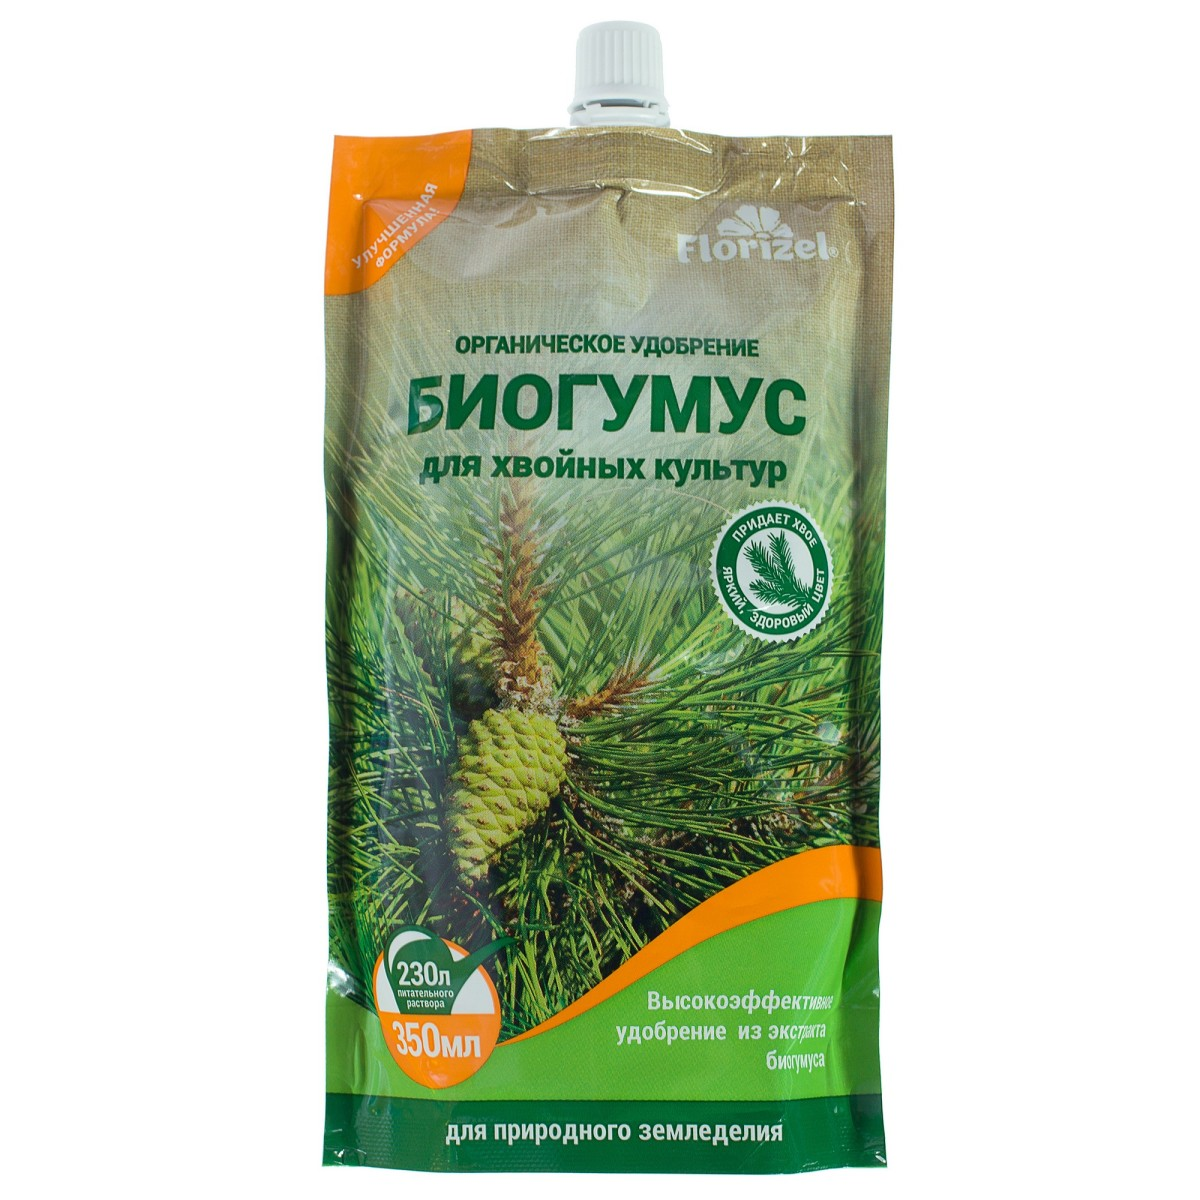 Биогумус Florizel для хвойных культур 0.35 л